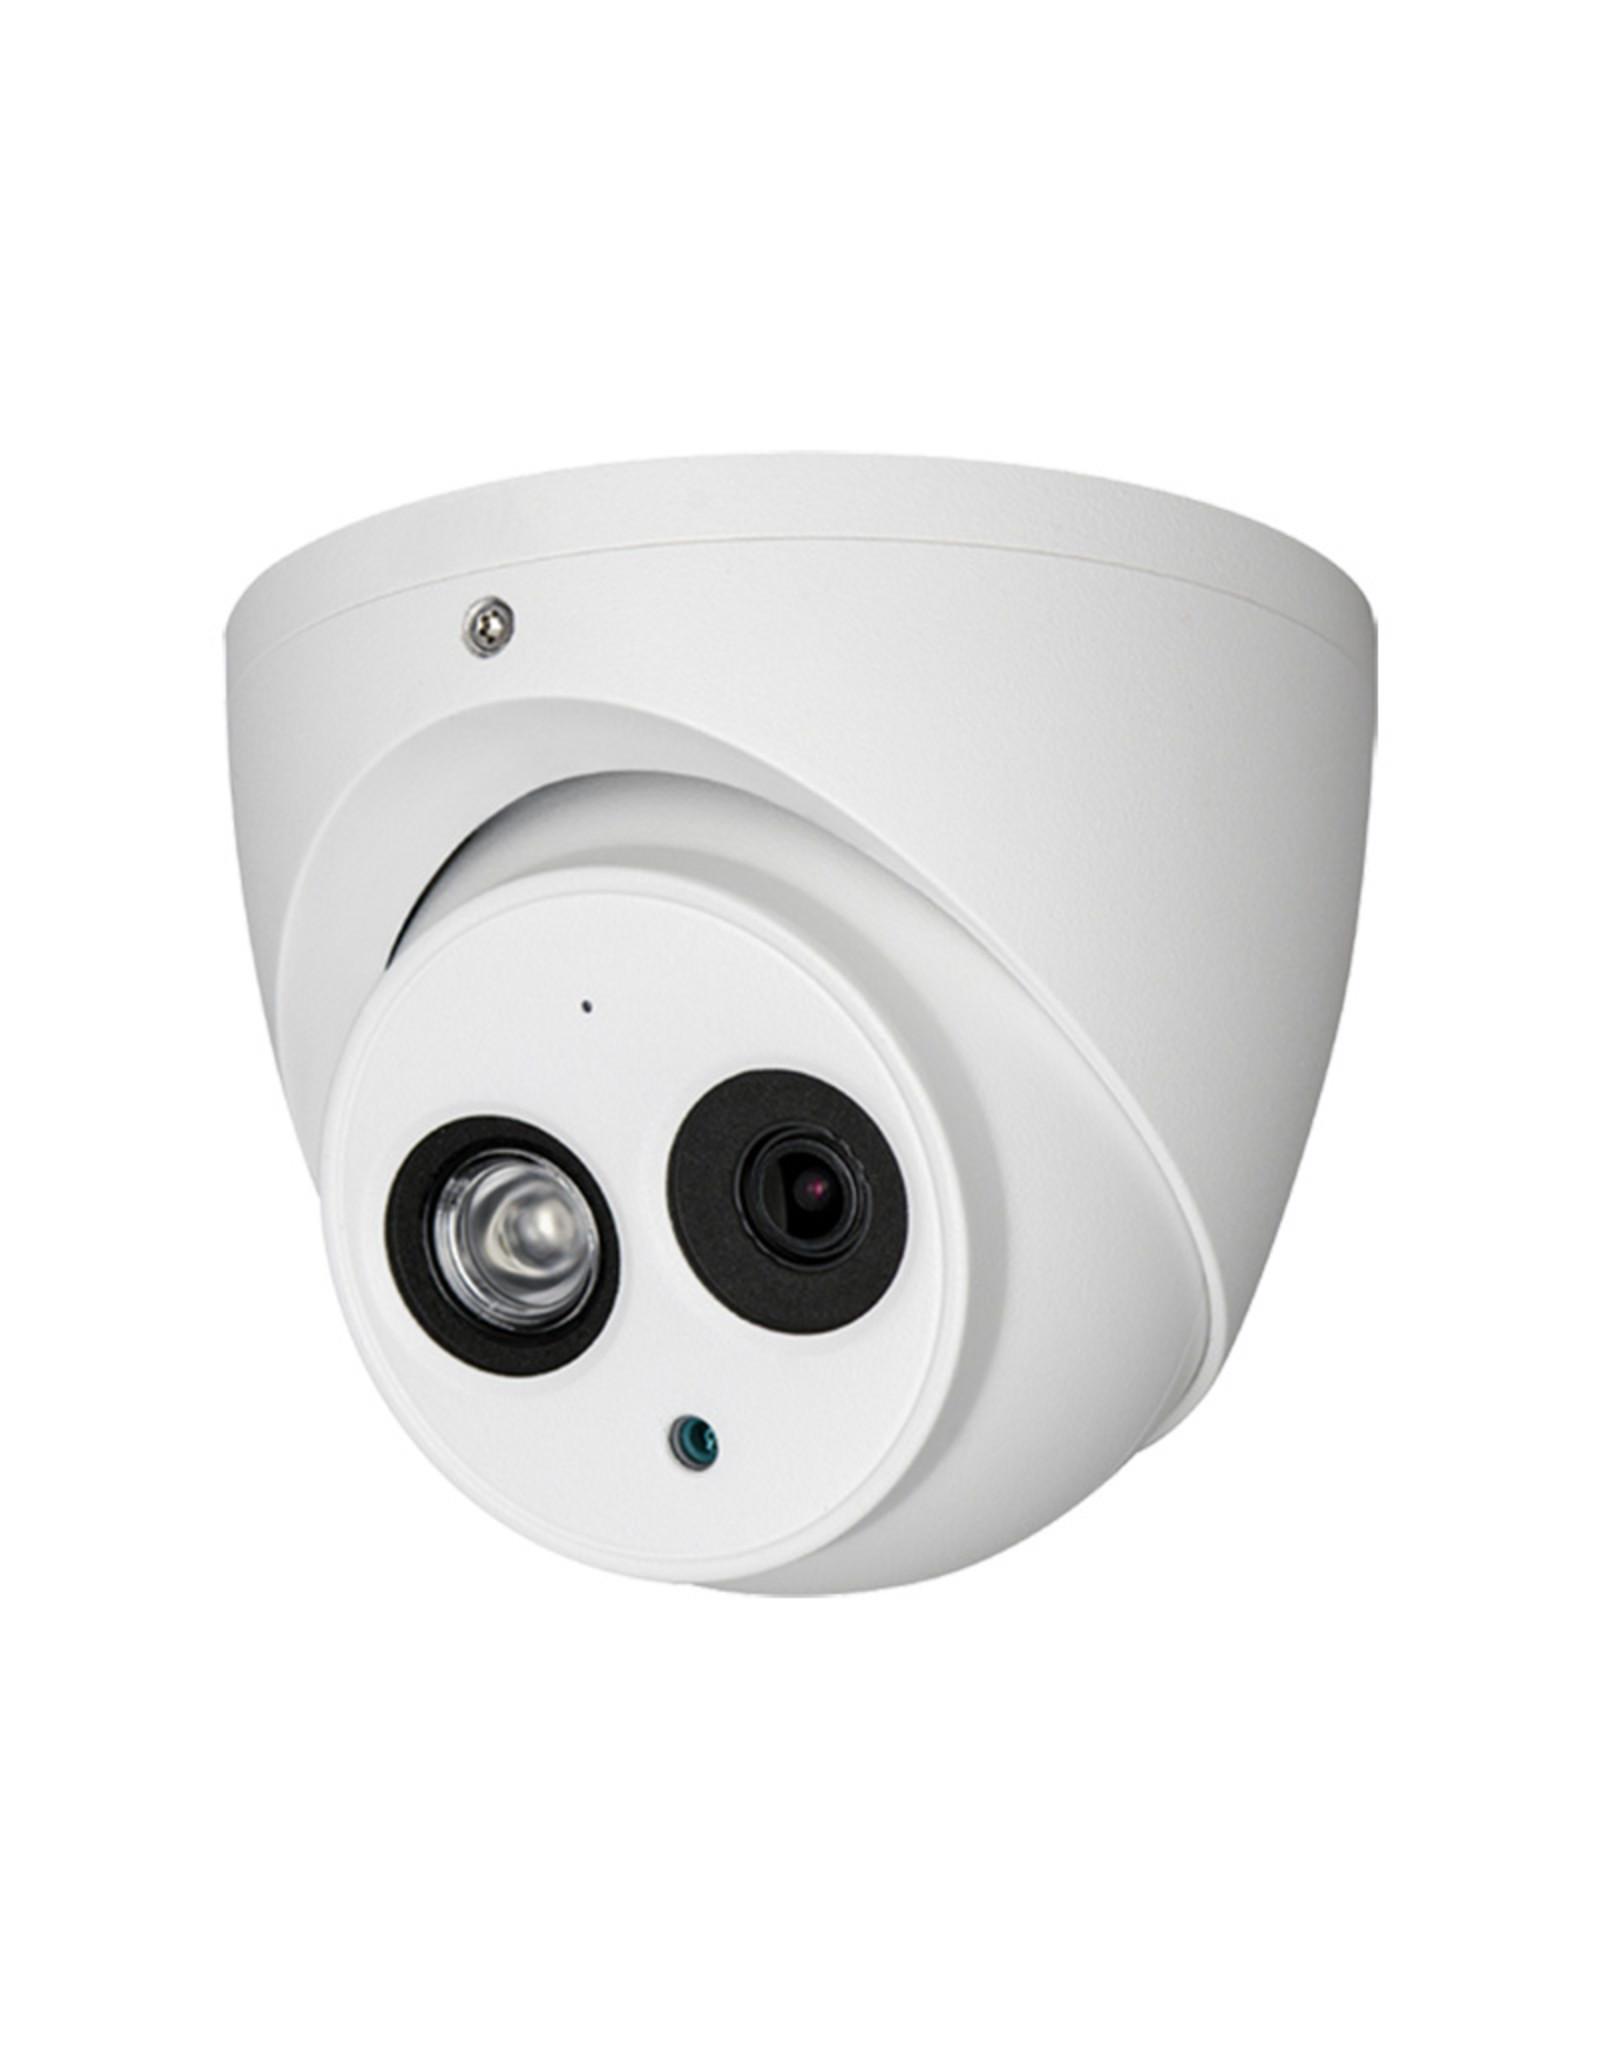 X-Security X-Security XS-IPDM885SAW-8-EPOE